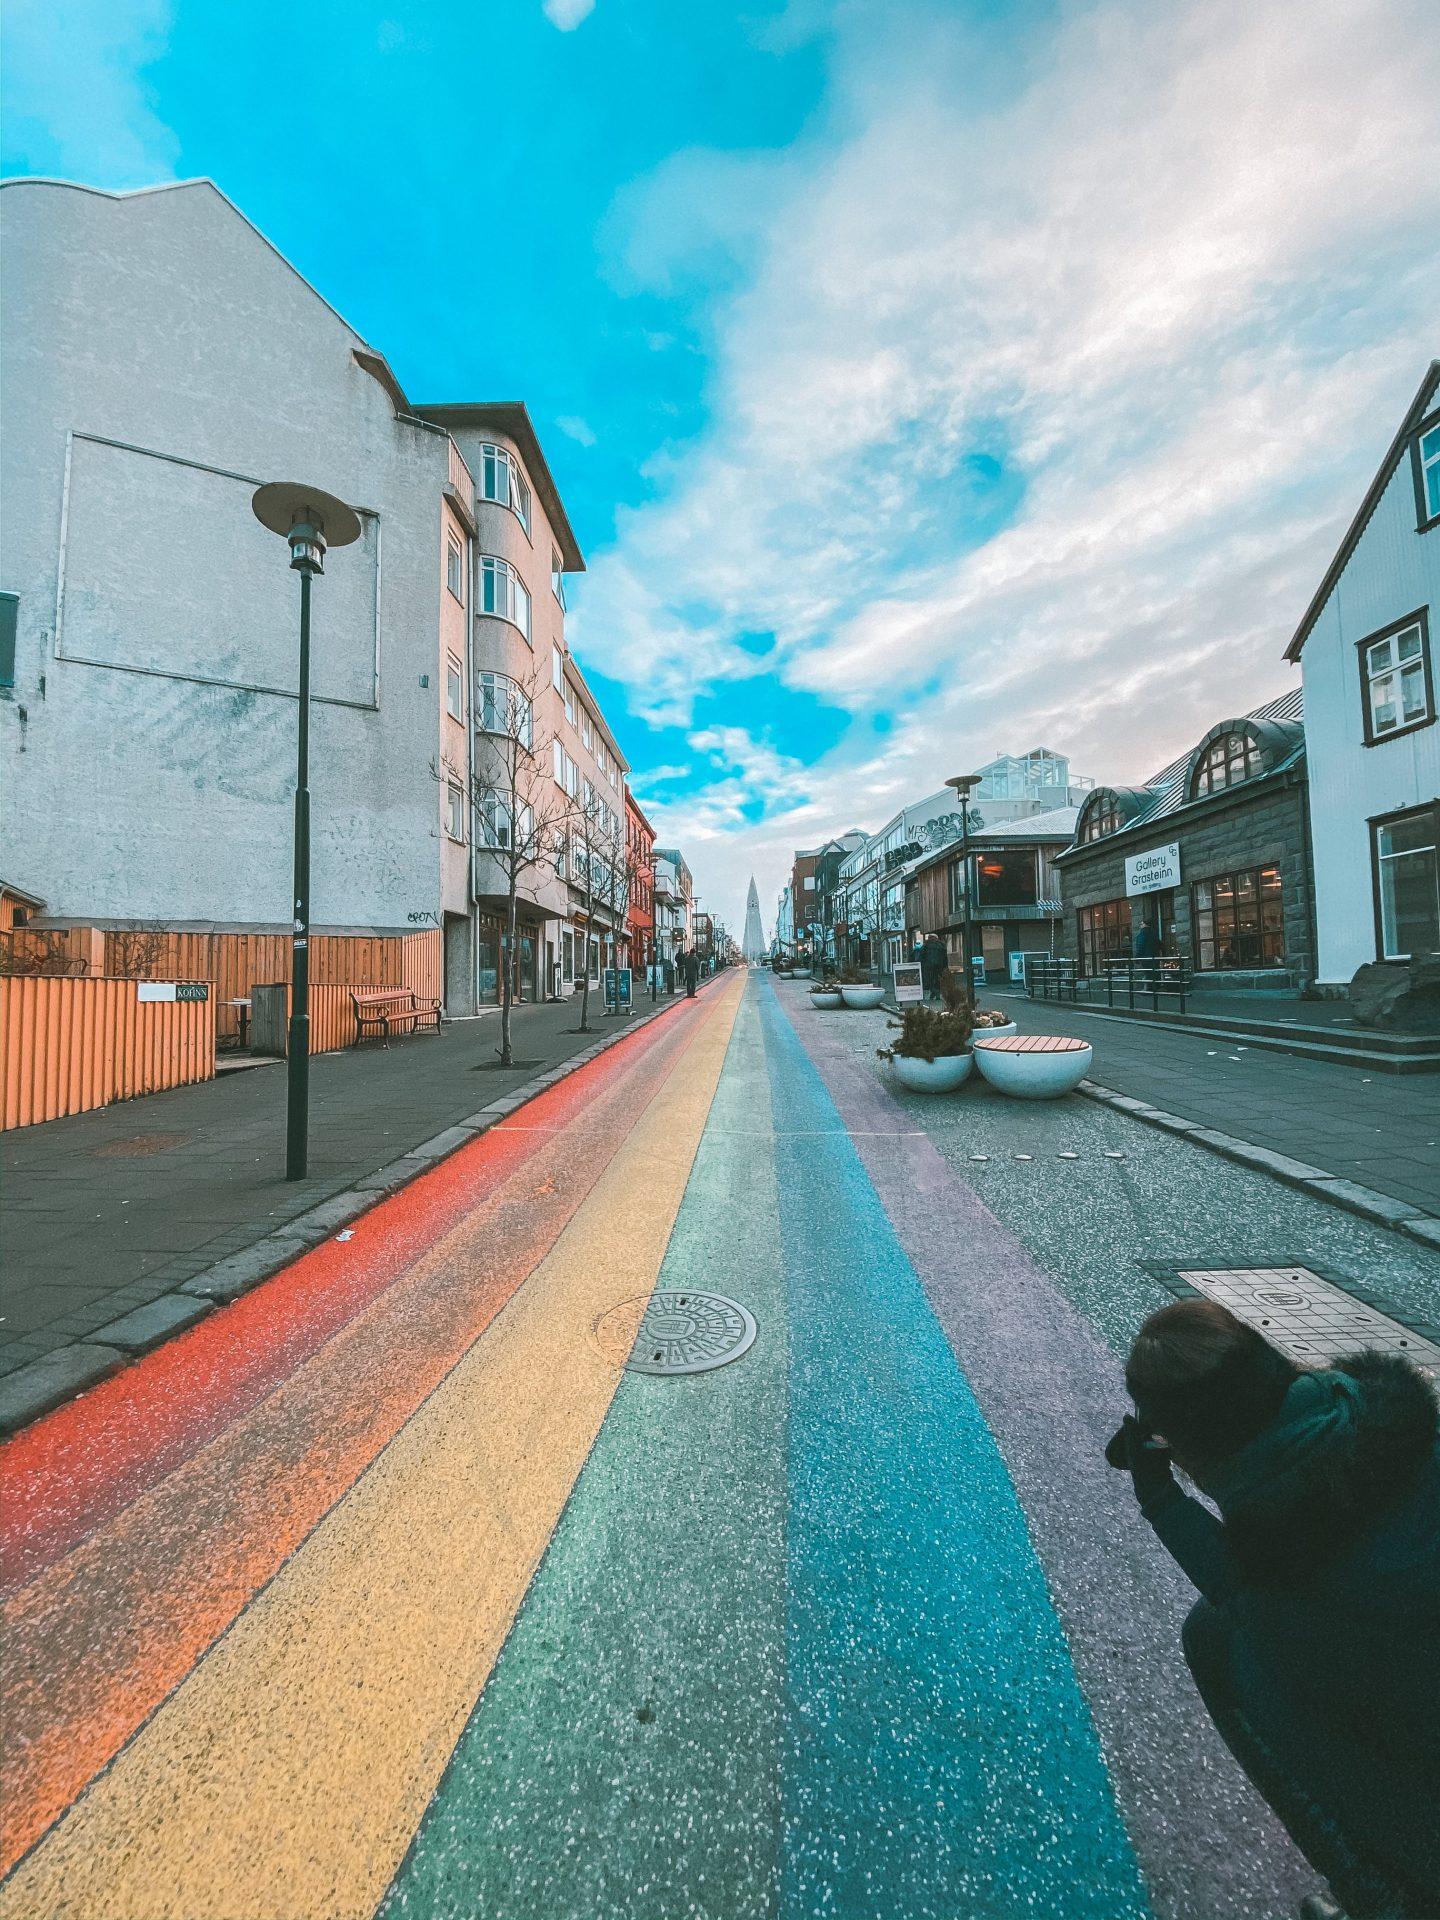 Rainbow street in Iceland